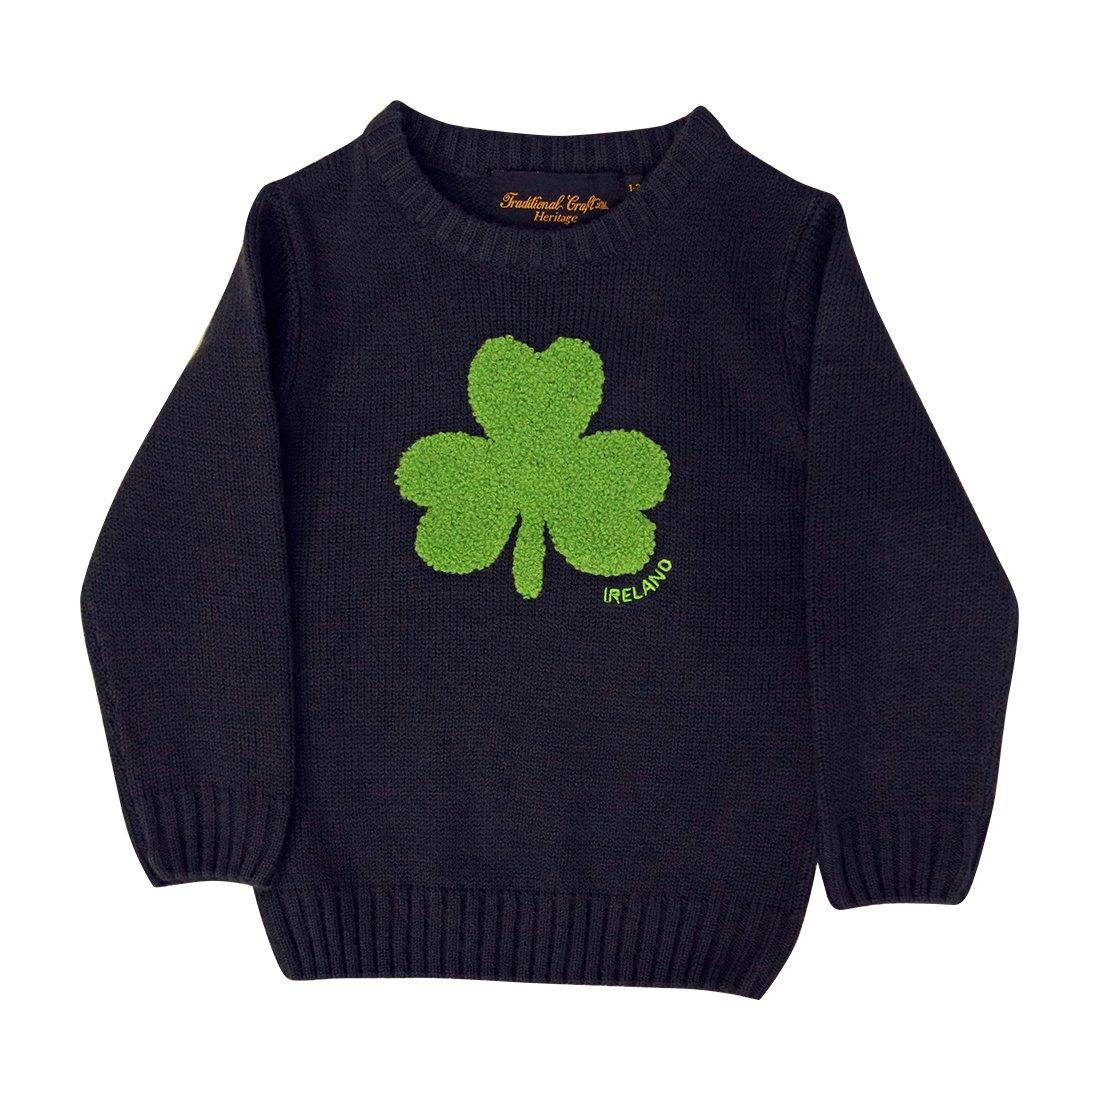 Round Neck Ireland Kids Sweater with Fluffy Shamrock, Navy Colour, 1-2 Years